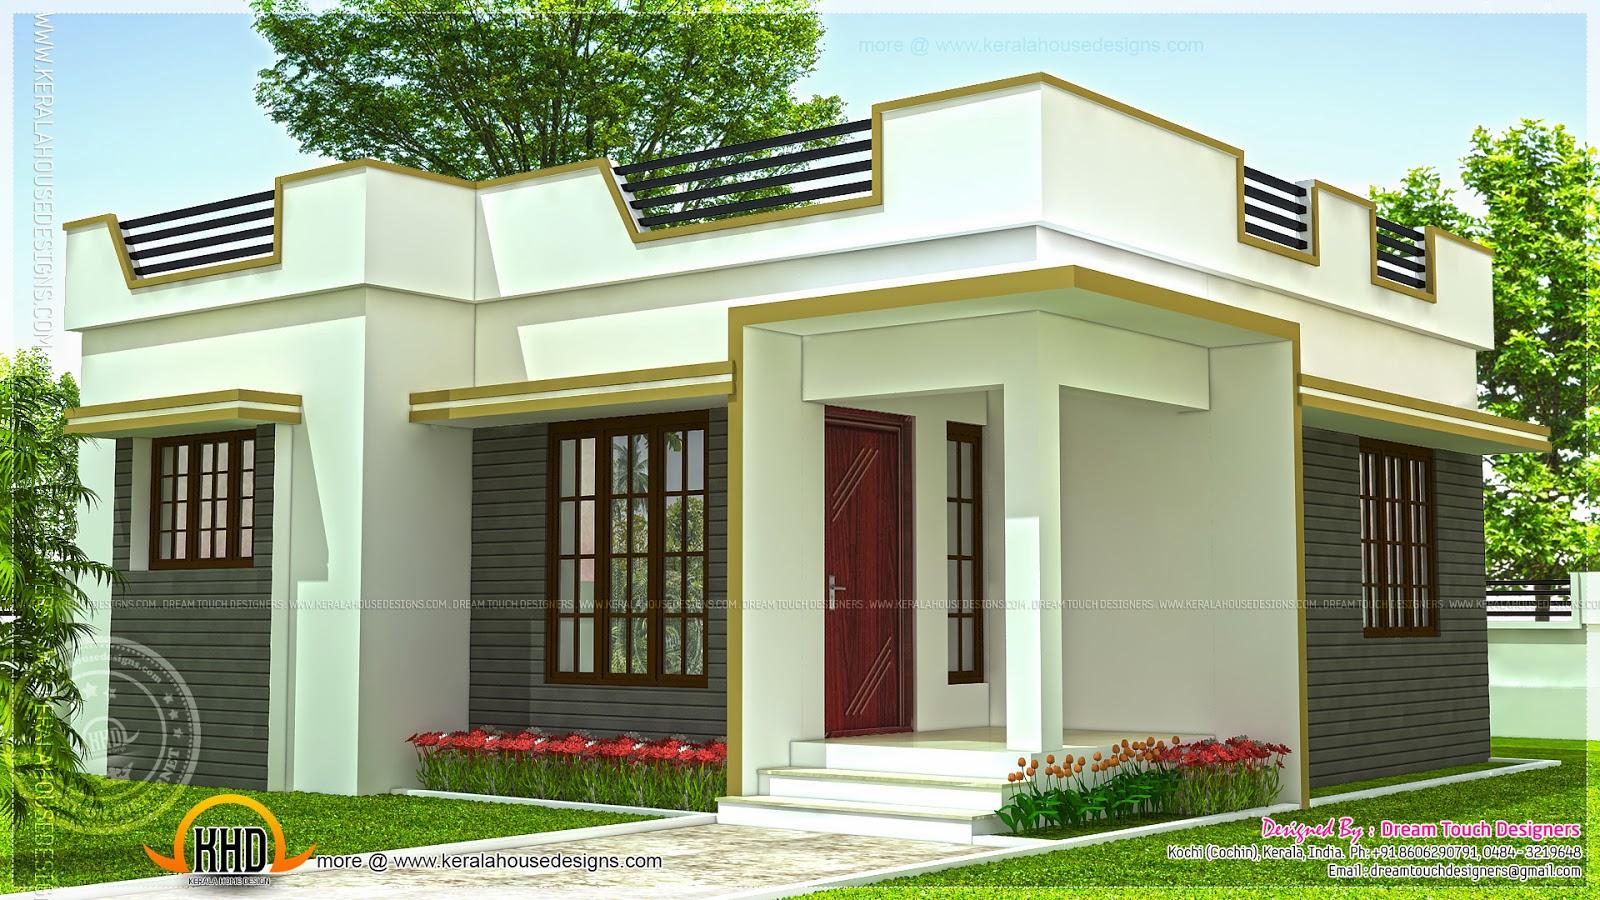 Small House In Kerala In 640 Square Feet  Kerala Home